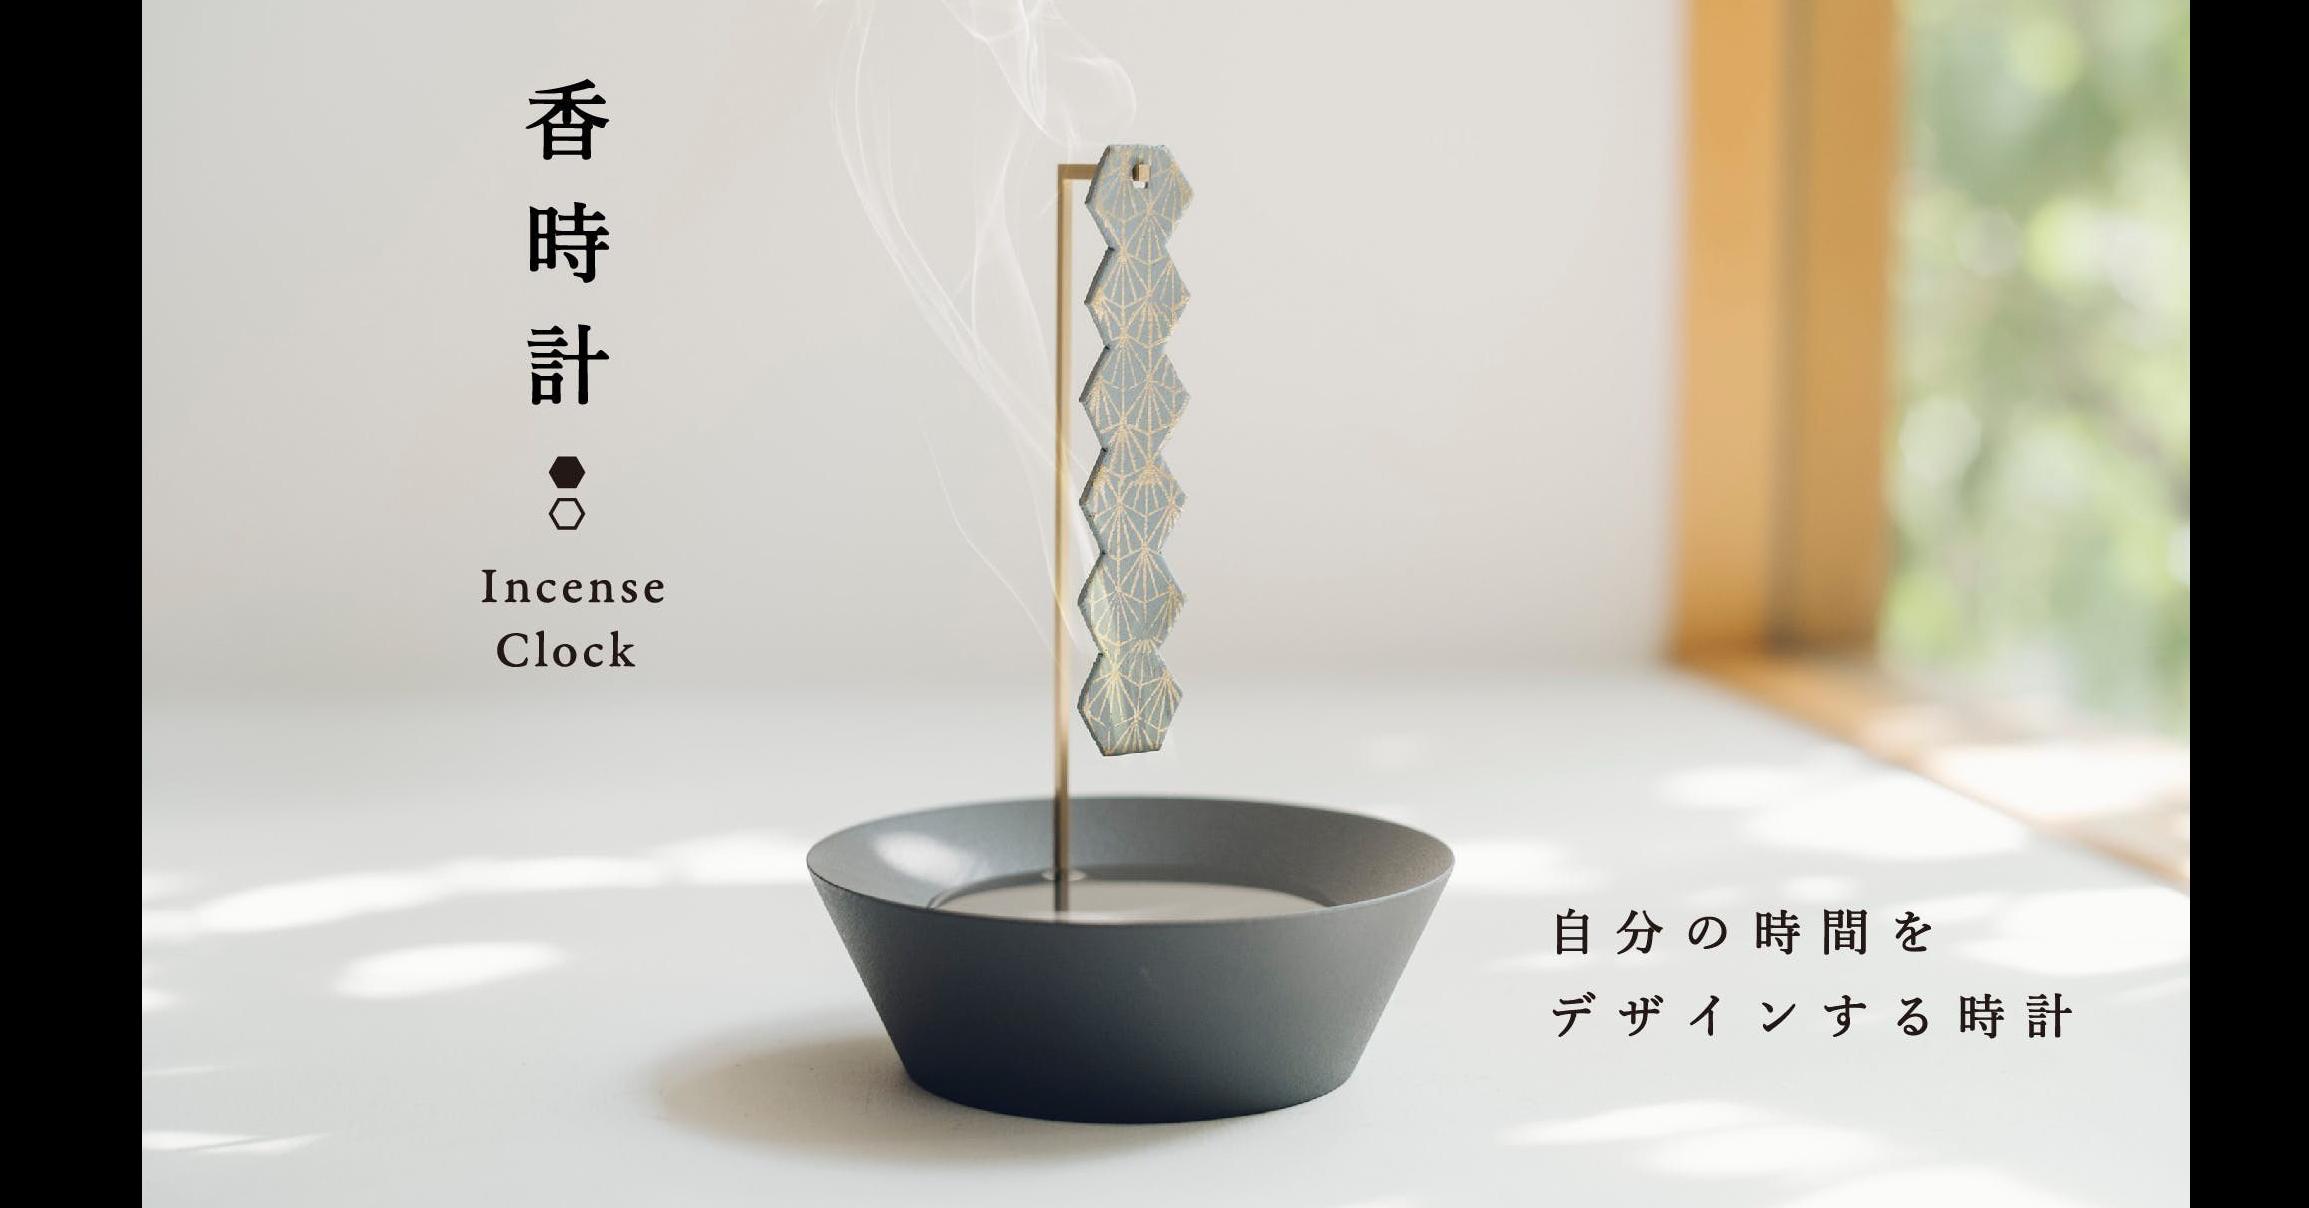 照片中提到了Incense、Clock、自分の時間を,包含了杯子、日本、設計、時間、攝影